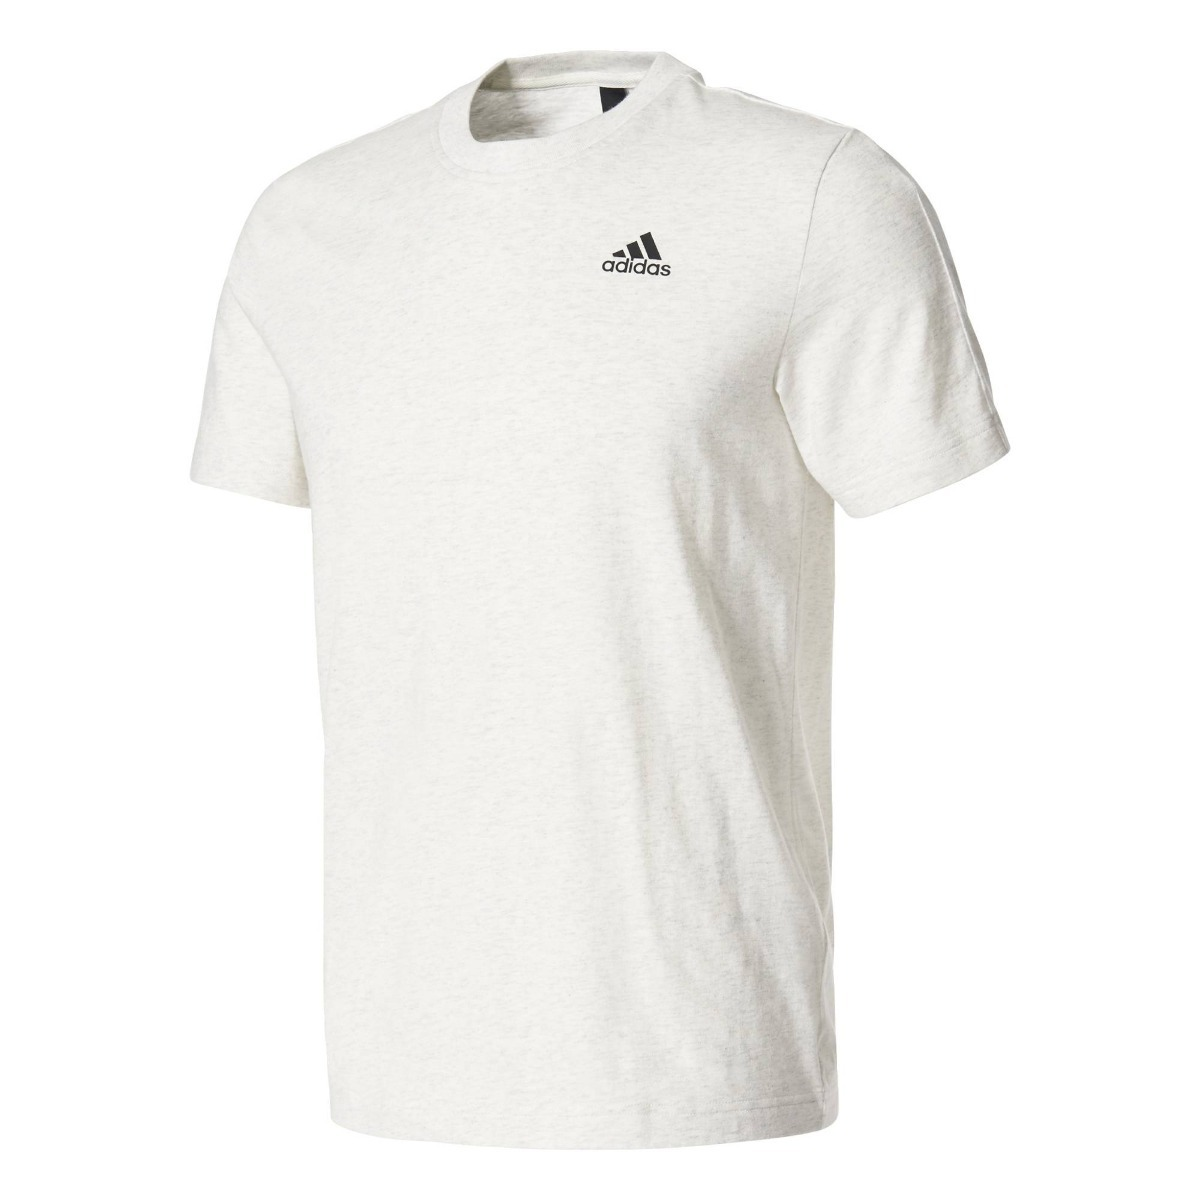 975dda3ef6 camiseta adidas essentials base - original. Carregando zoom.